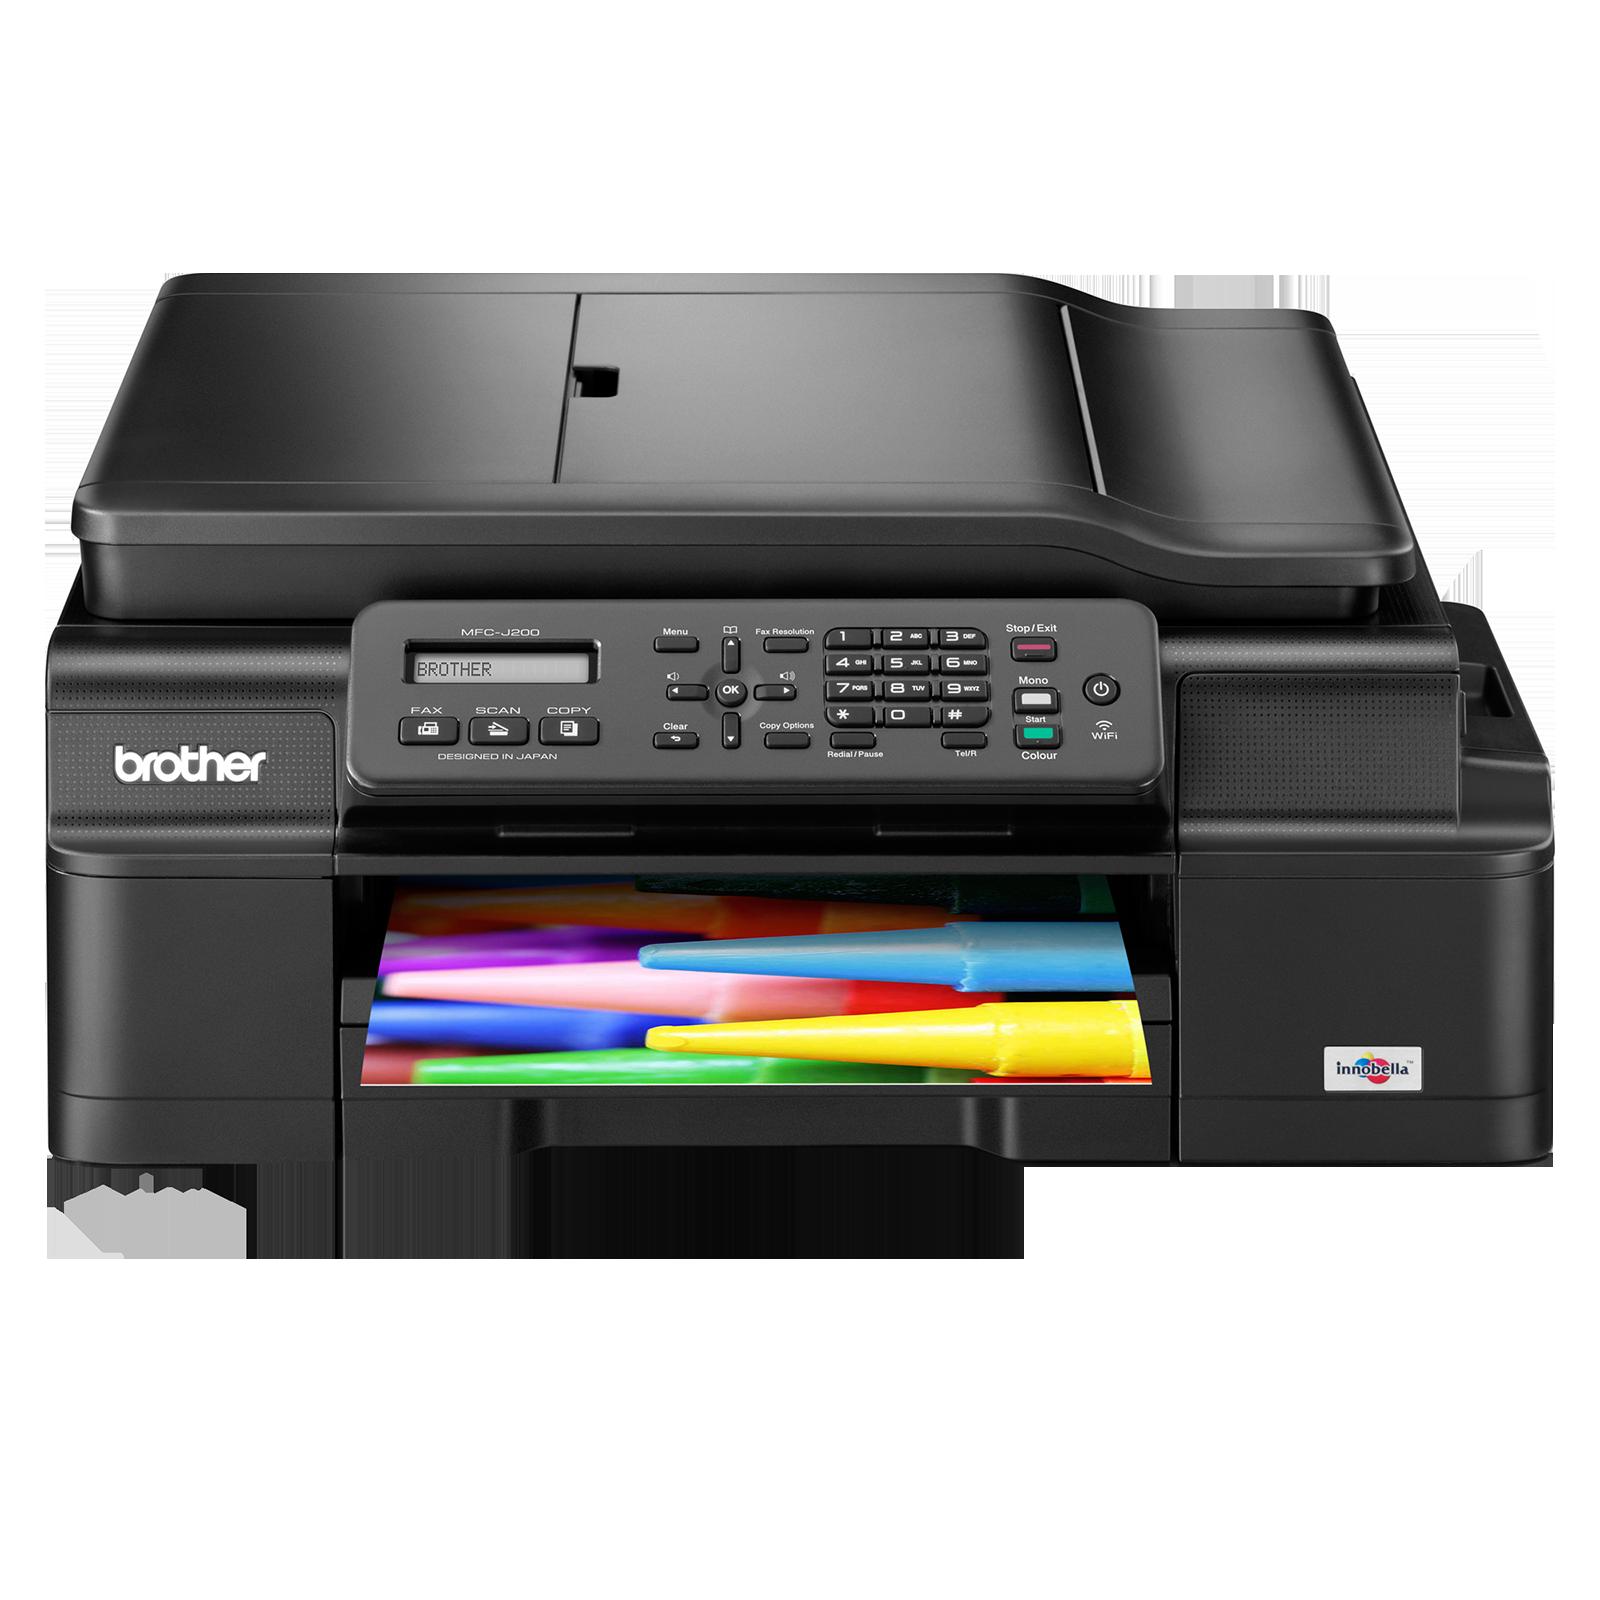 Brother MFCJ200YJ1, Multifunctional inkjet A4 (print/copy/scan/fax), viteza printare: 11 imp mono / 6 ipm color, viteza copiere: 4.8 ipm mono / 3 ipm color, conectivitate: USB 2.0 , wireless, copiere multipla: 99 copii, ADF: 20 coli, tava intrare: 100 col